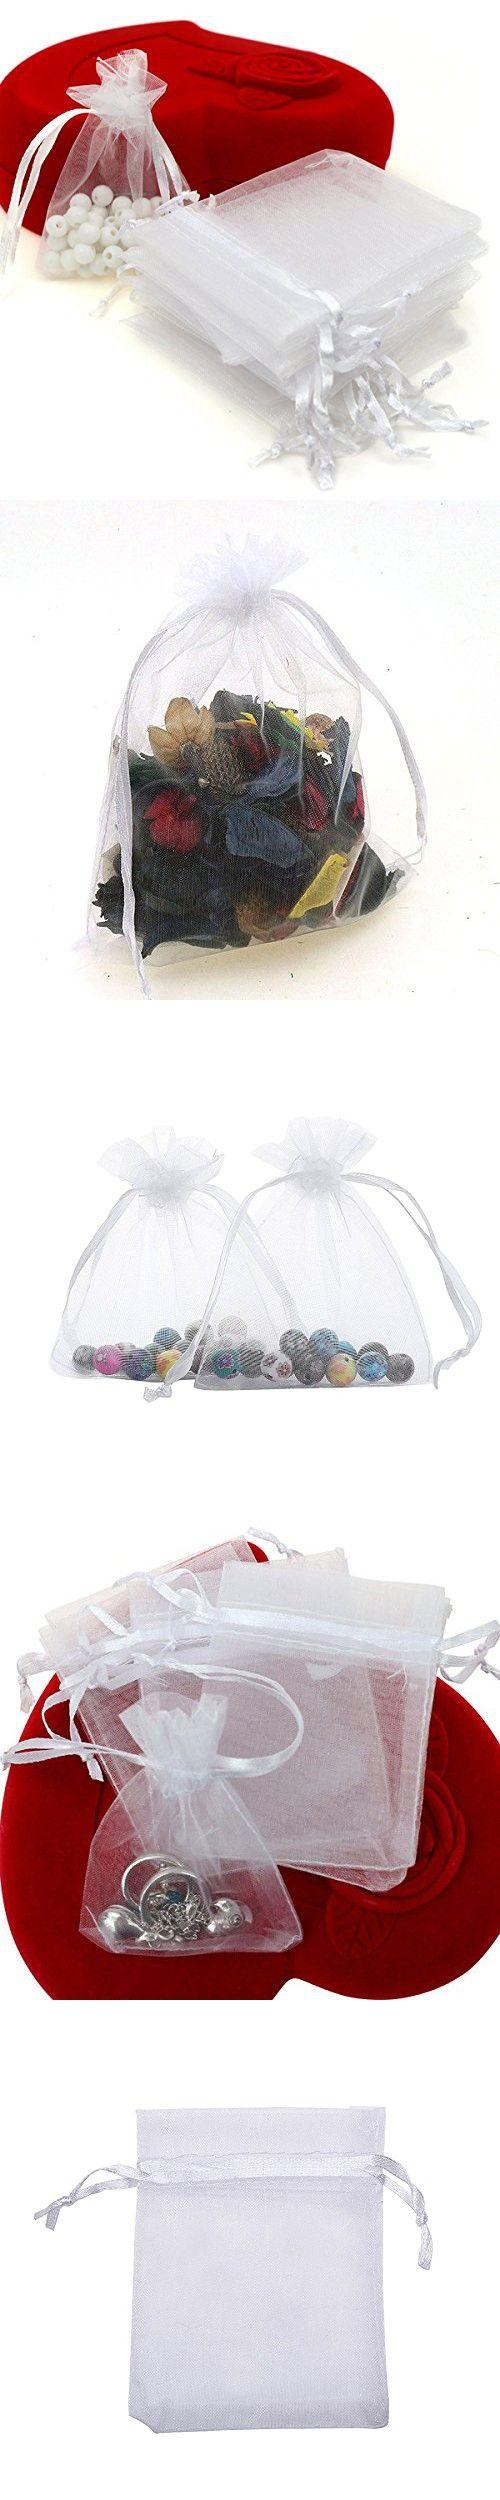 Dealglad 100pcs Drawstring Organza Jewelry Candy Pouch Party Wedding ...